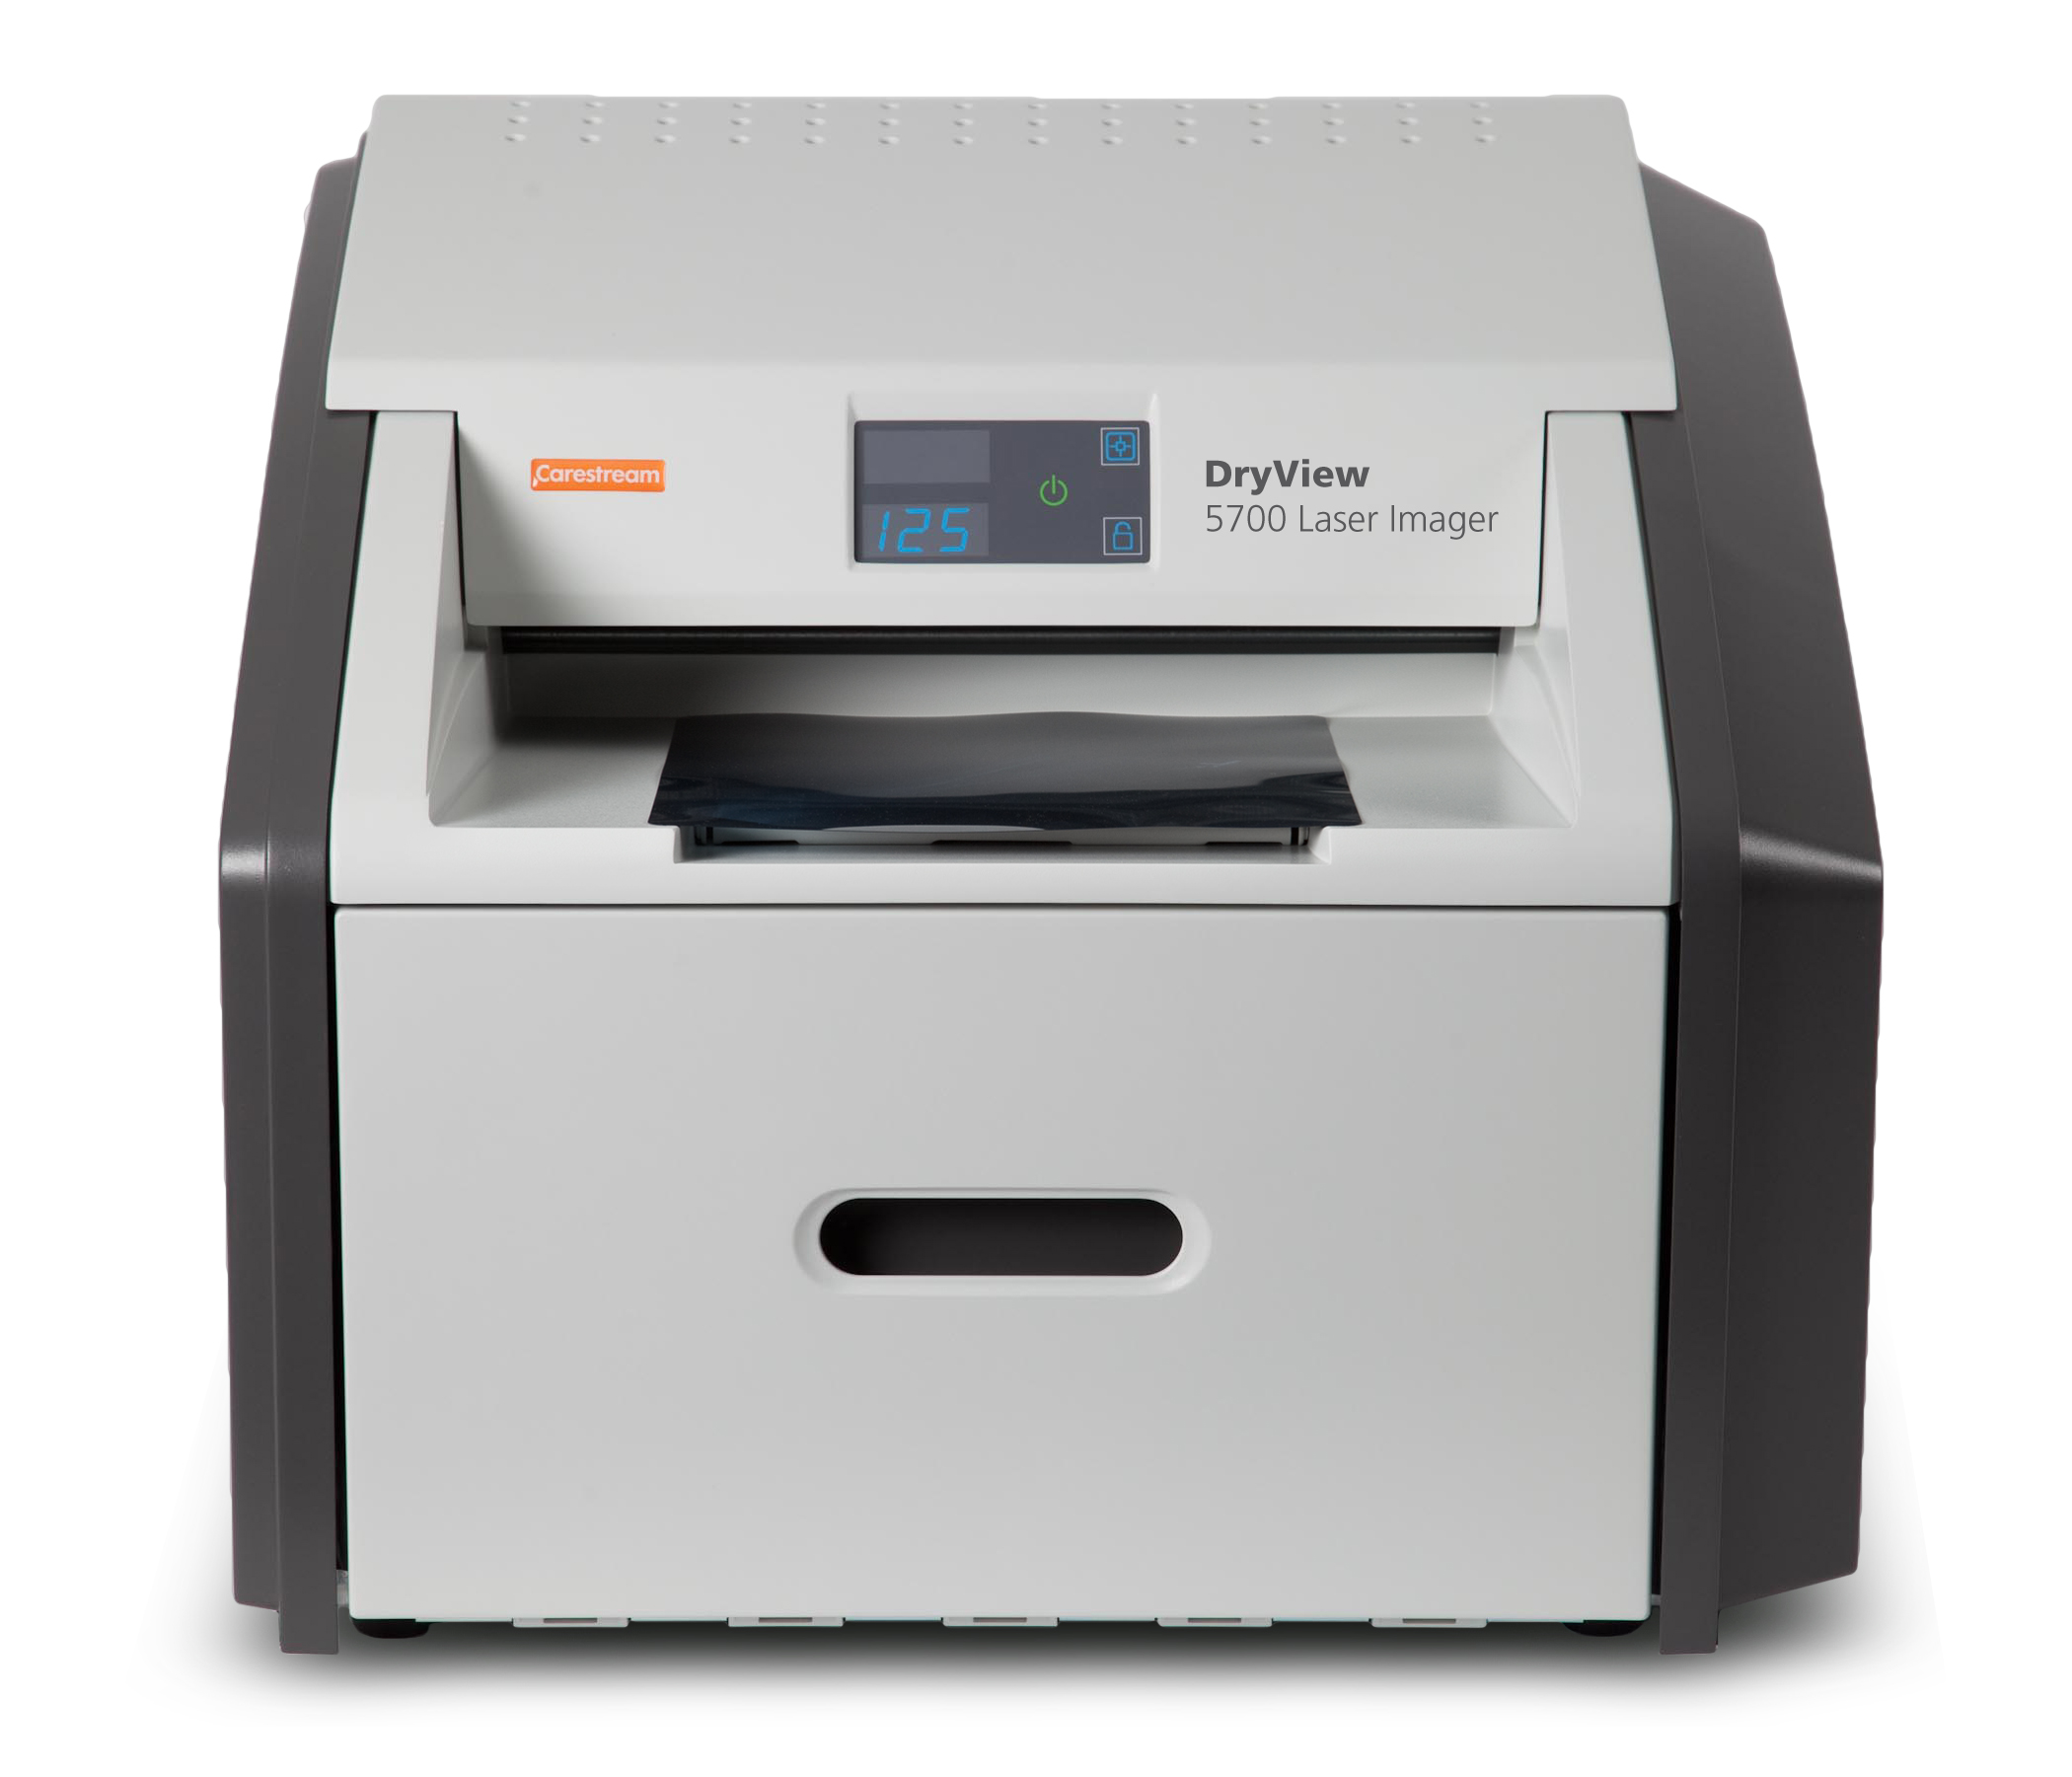 Carestream impresora dryview 5700